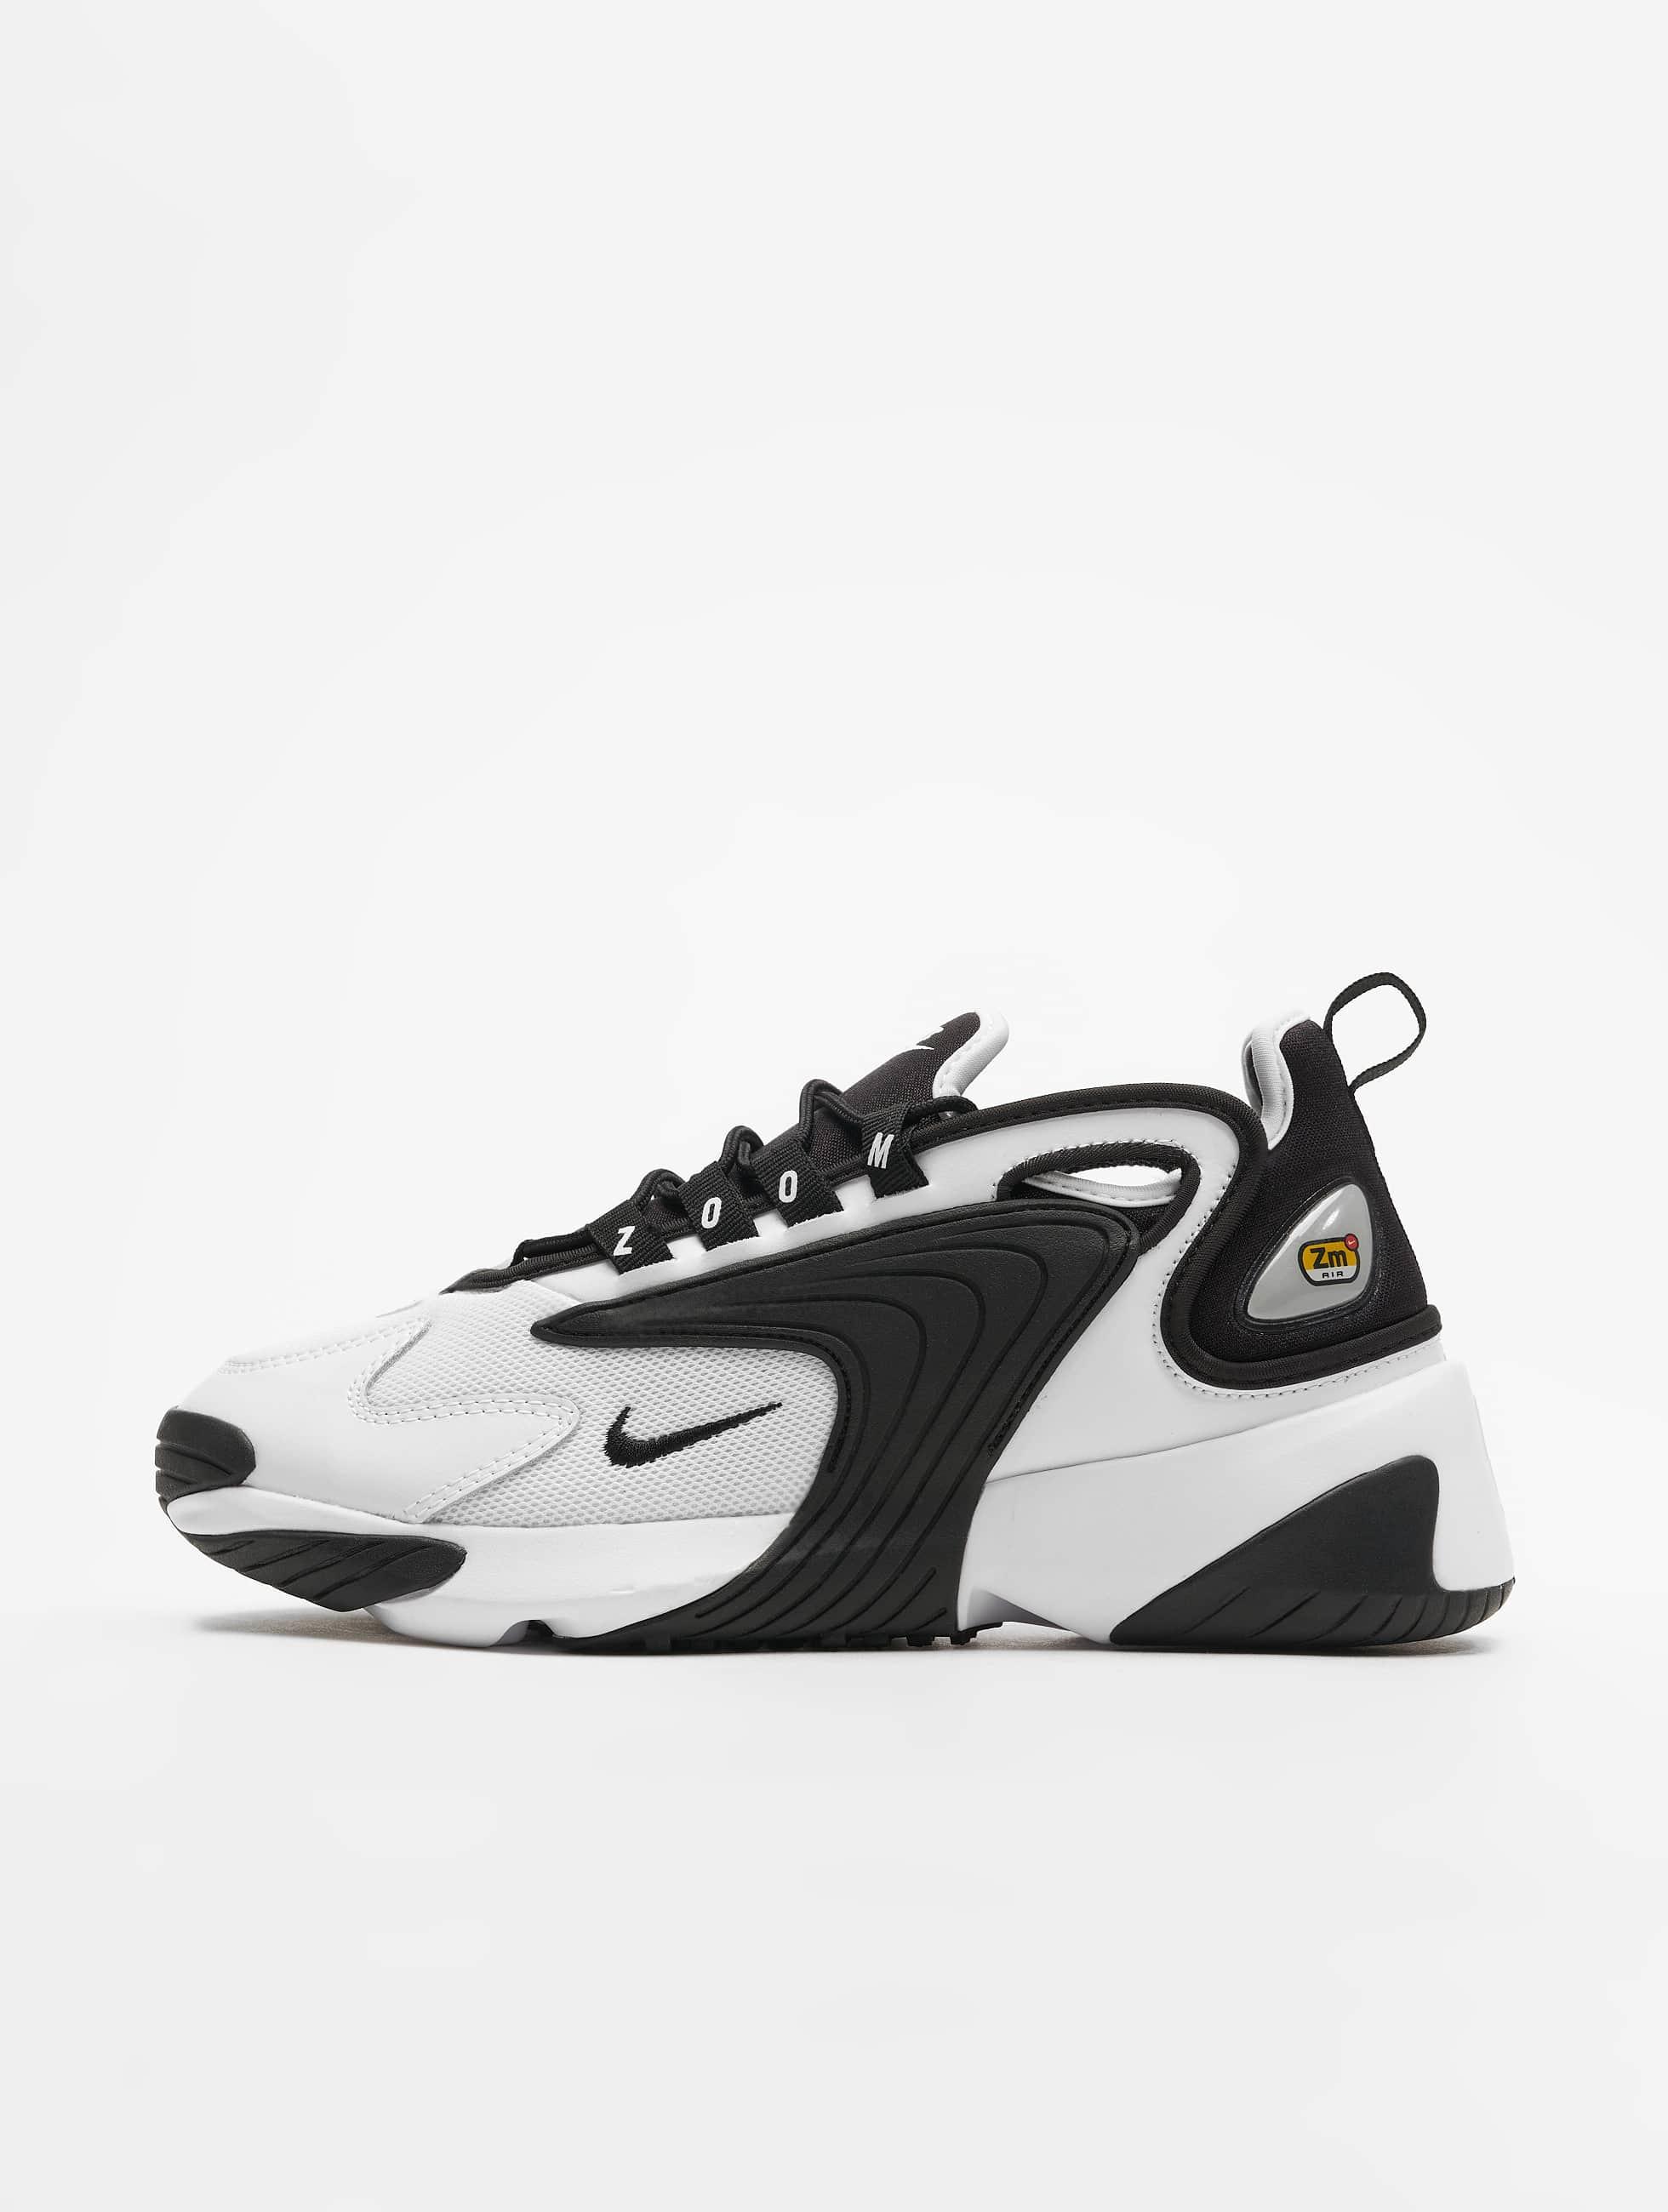 Nike Zoom Nike Sneakers Zoom Zoom Sneakers Nike Whiteblack 2k 2k Whiteblack CBErdoeQxW